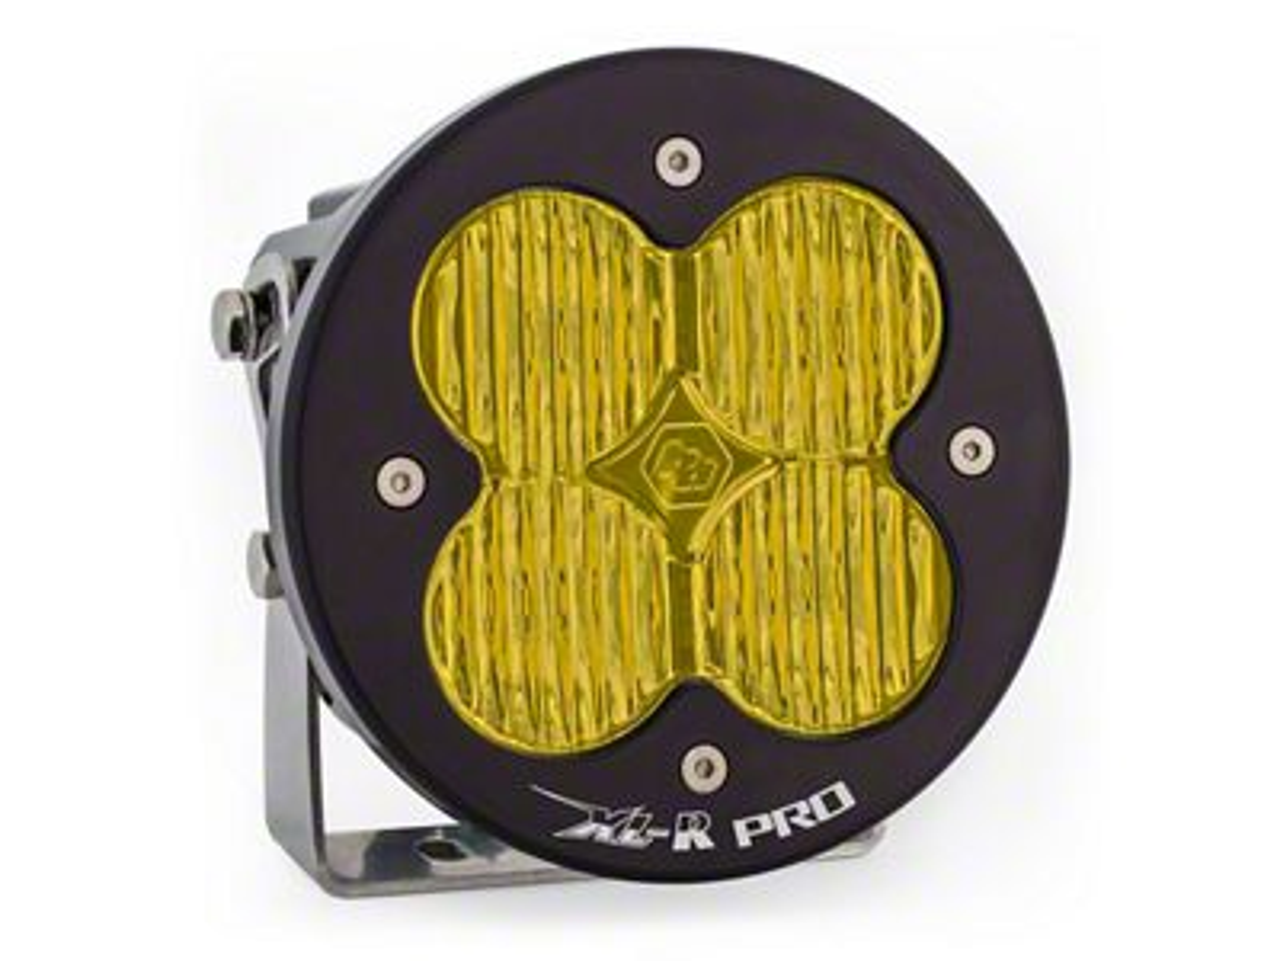 Baja Designs XL-R Amber Pro LED Light - Wide Cornering Beam